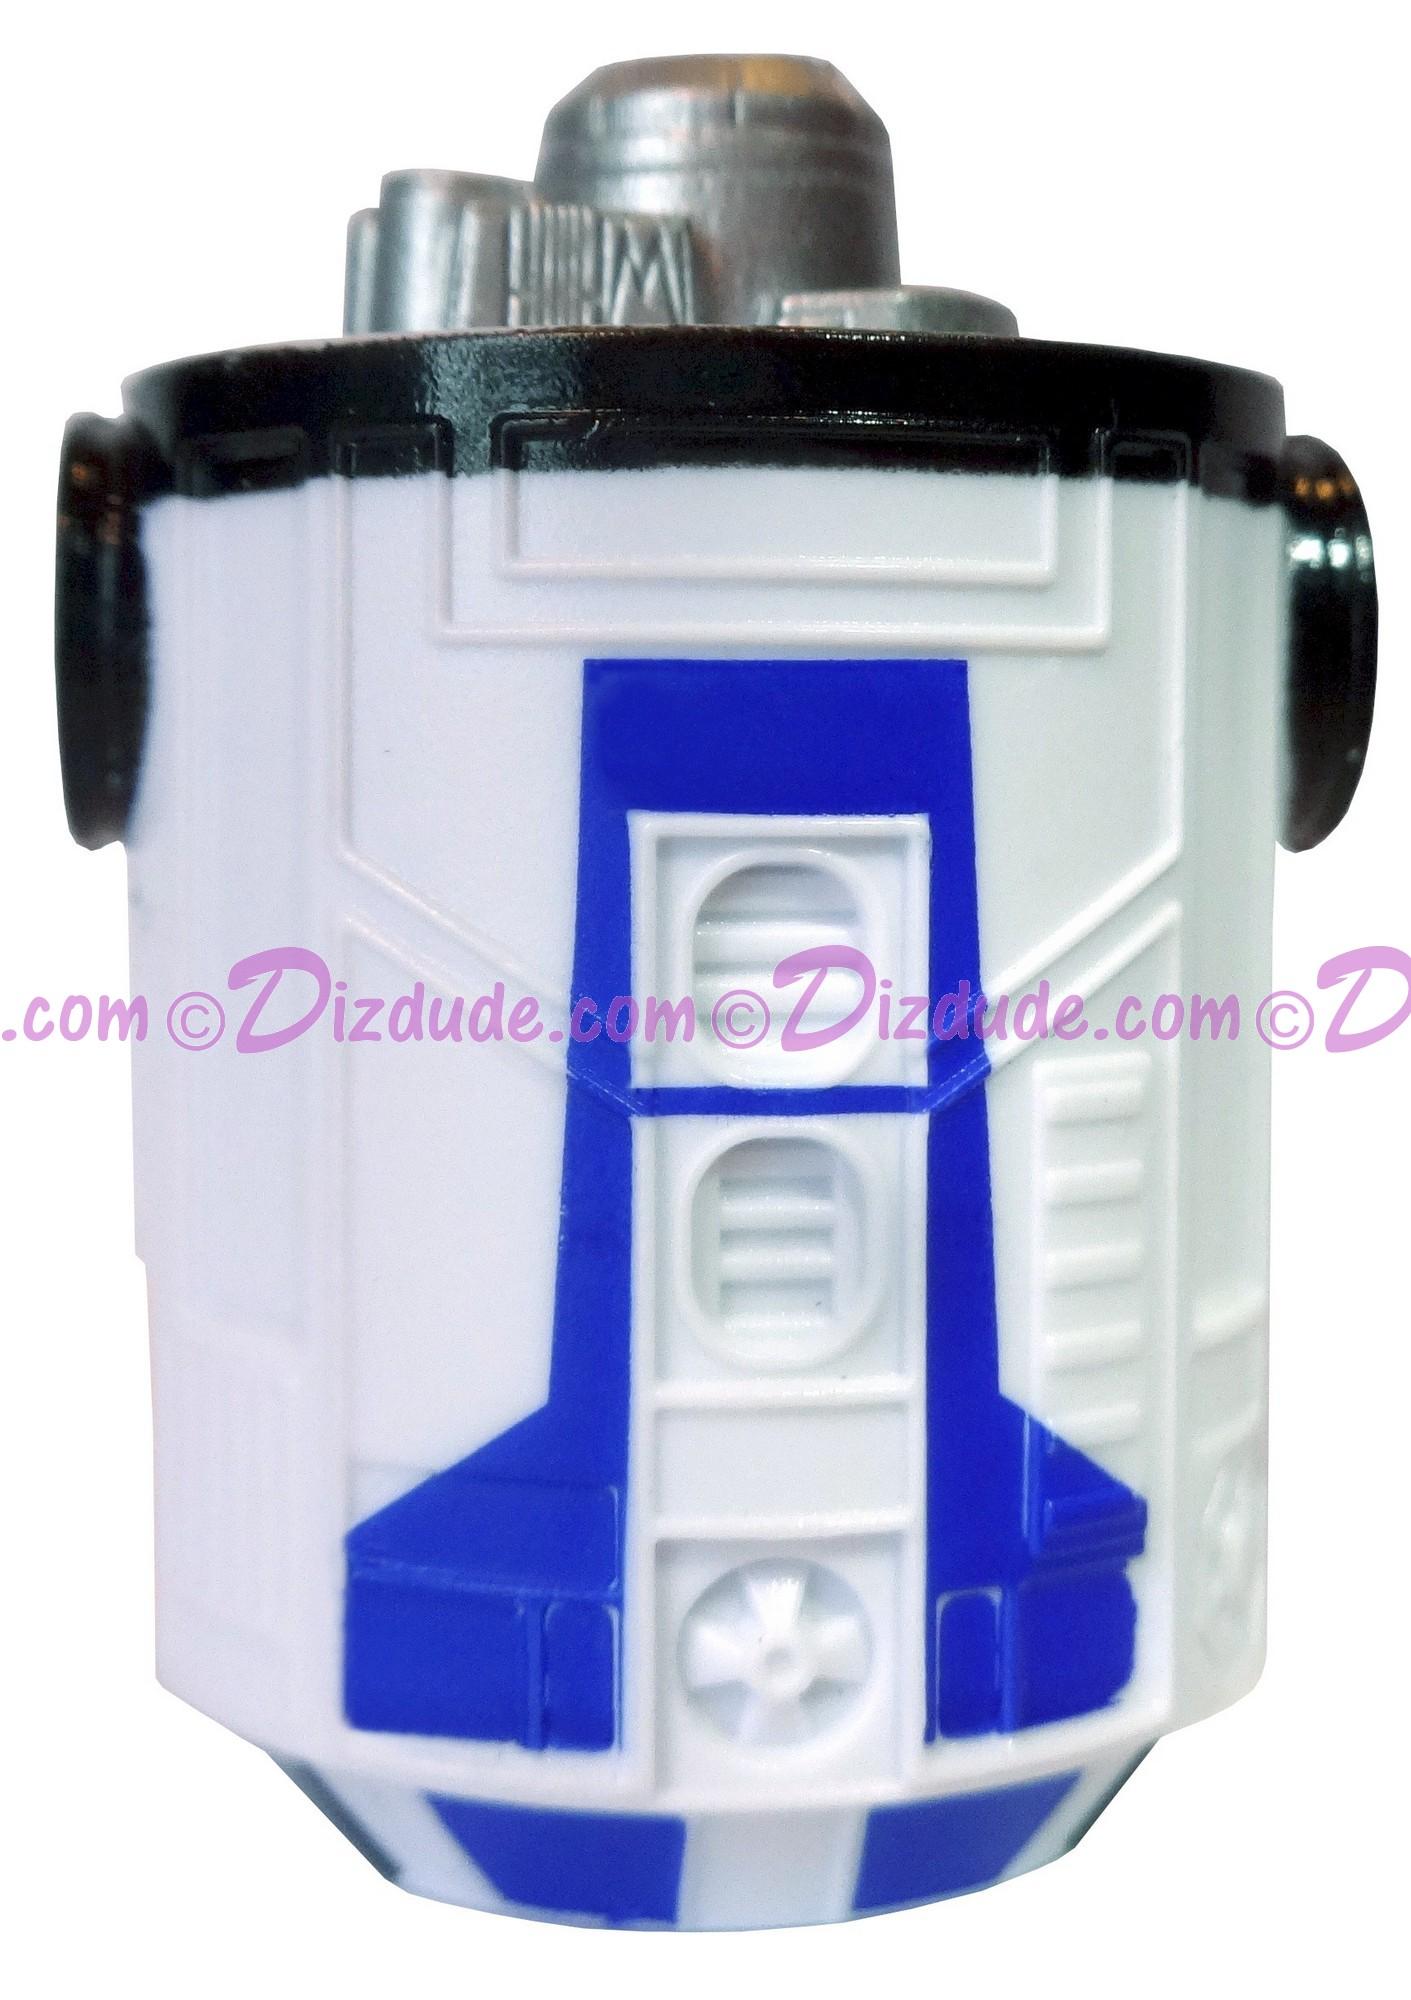 White - Blue & Black  Astromech Droid Body ~ Series 2 from Disney Star Wars Build-A-Droid Factory © Dizdude.com